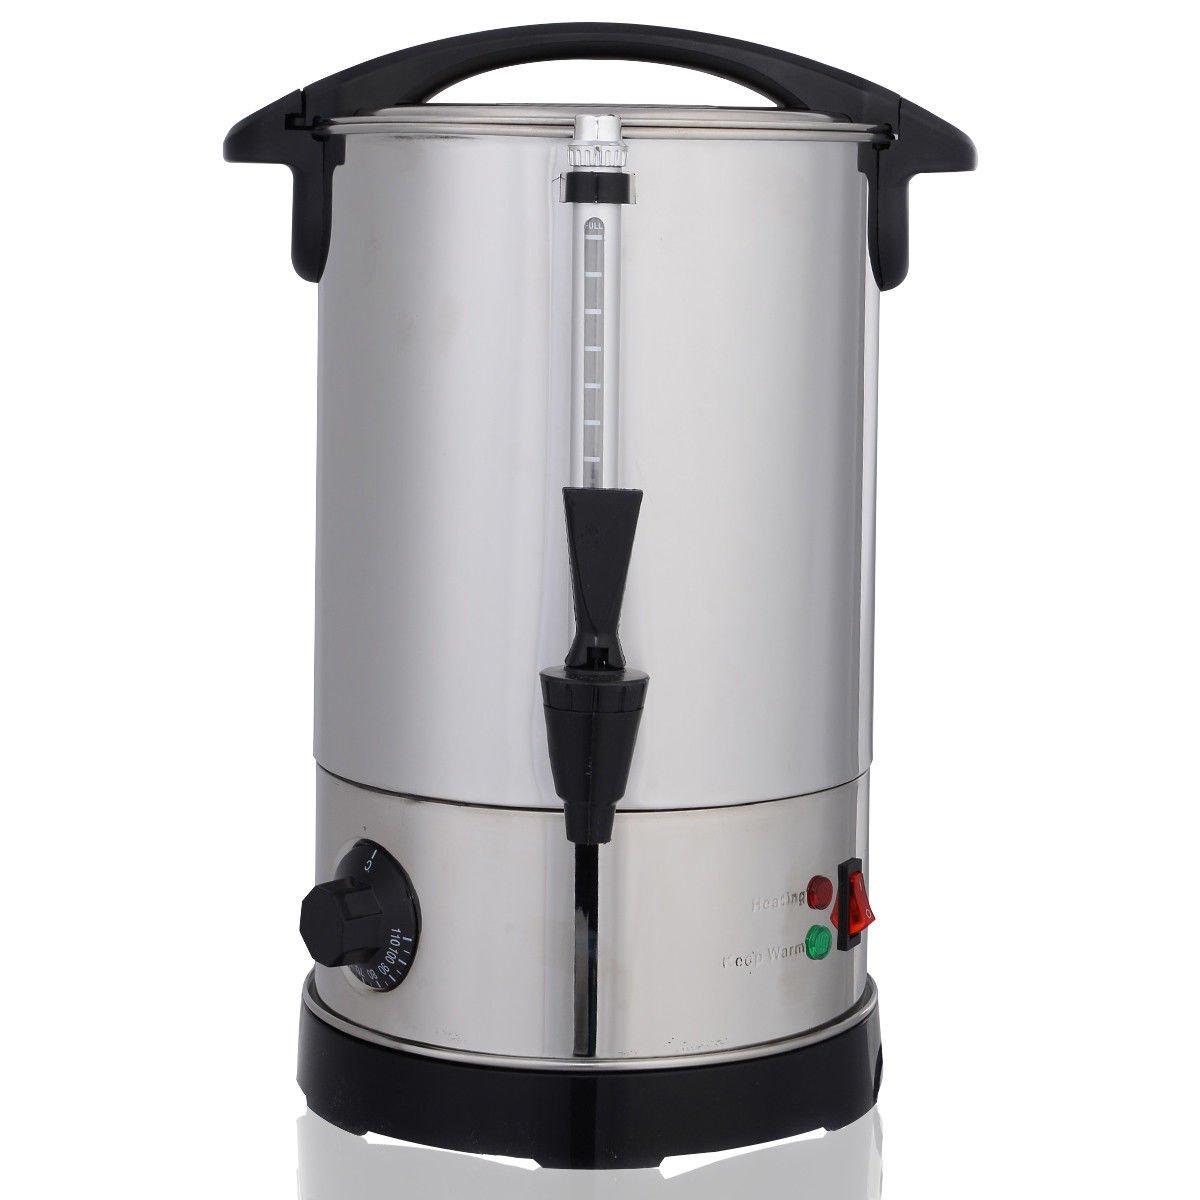 lunanice Stainless Steel 6 Quart Electric Water Boiler Warmer Hot Water Kettle Dispenser